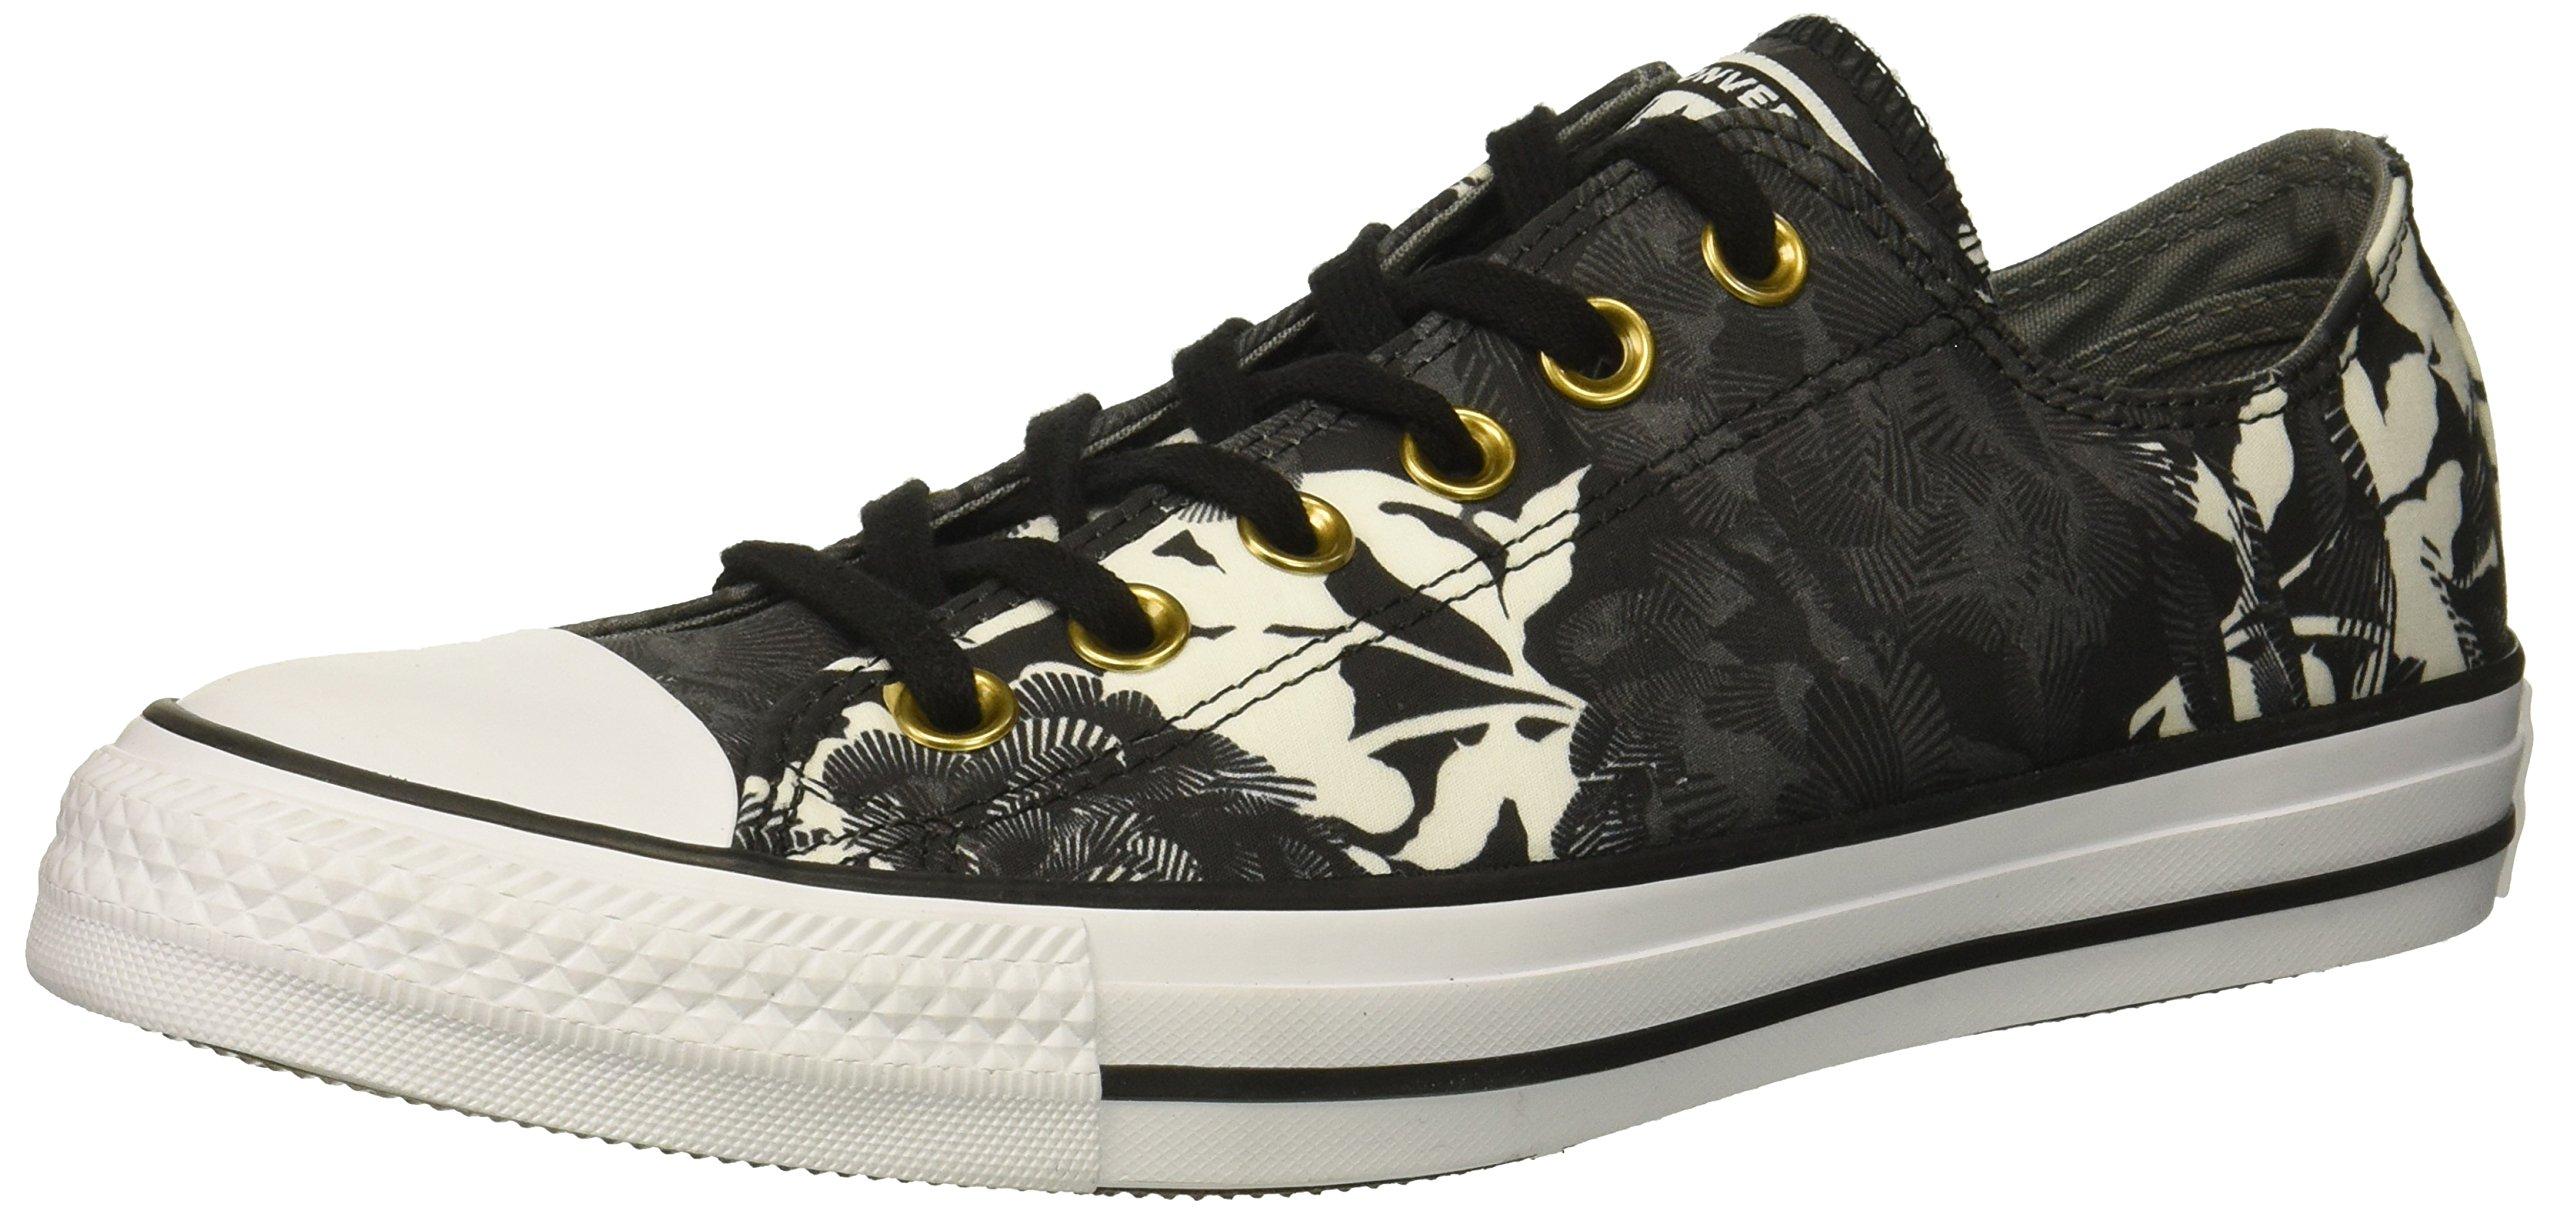 Converse Women's Chuck Taylor All Star Floral Print Low Top Sneaker, Black/Mason/White, 9 M US